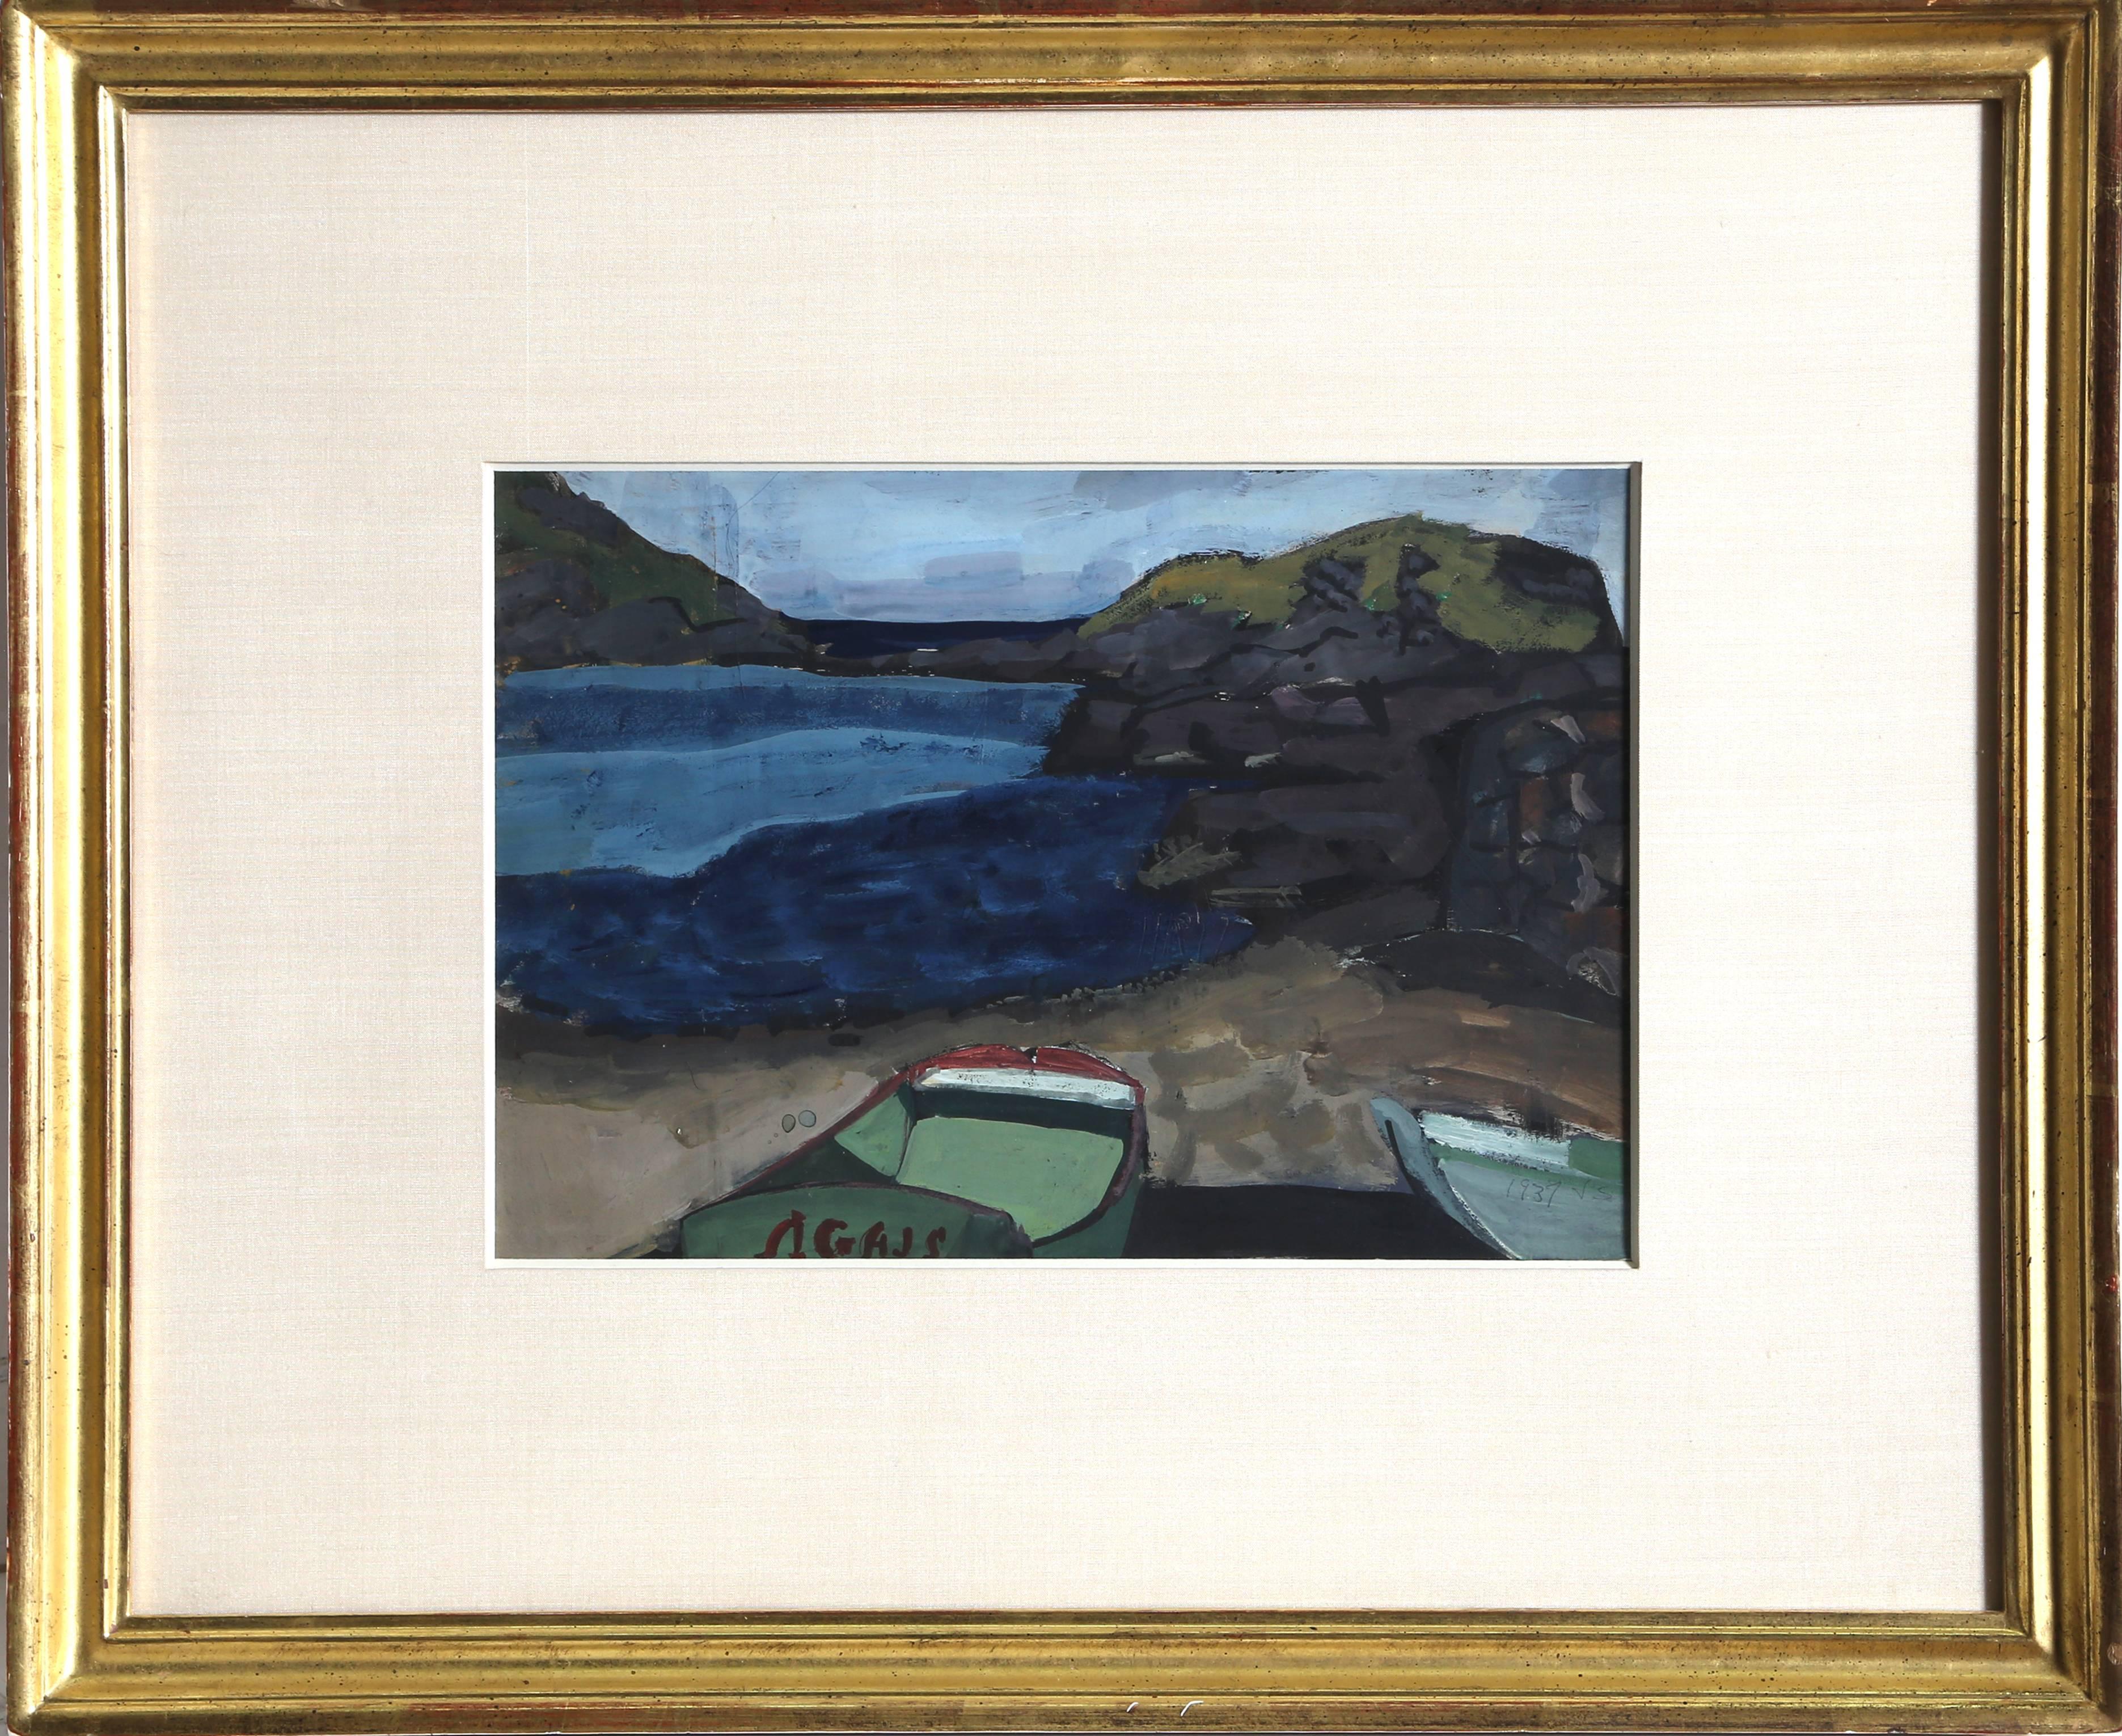 Monhegan Cove, Gouache Painting by Joseph Solman 1937